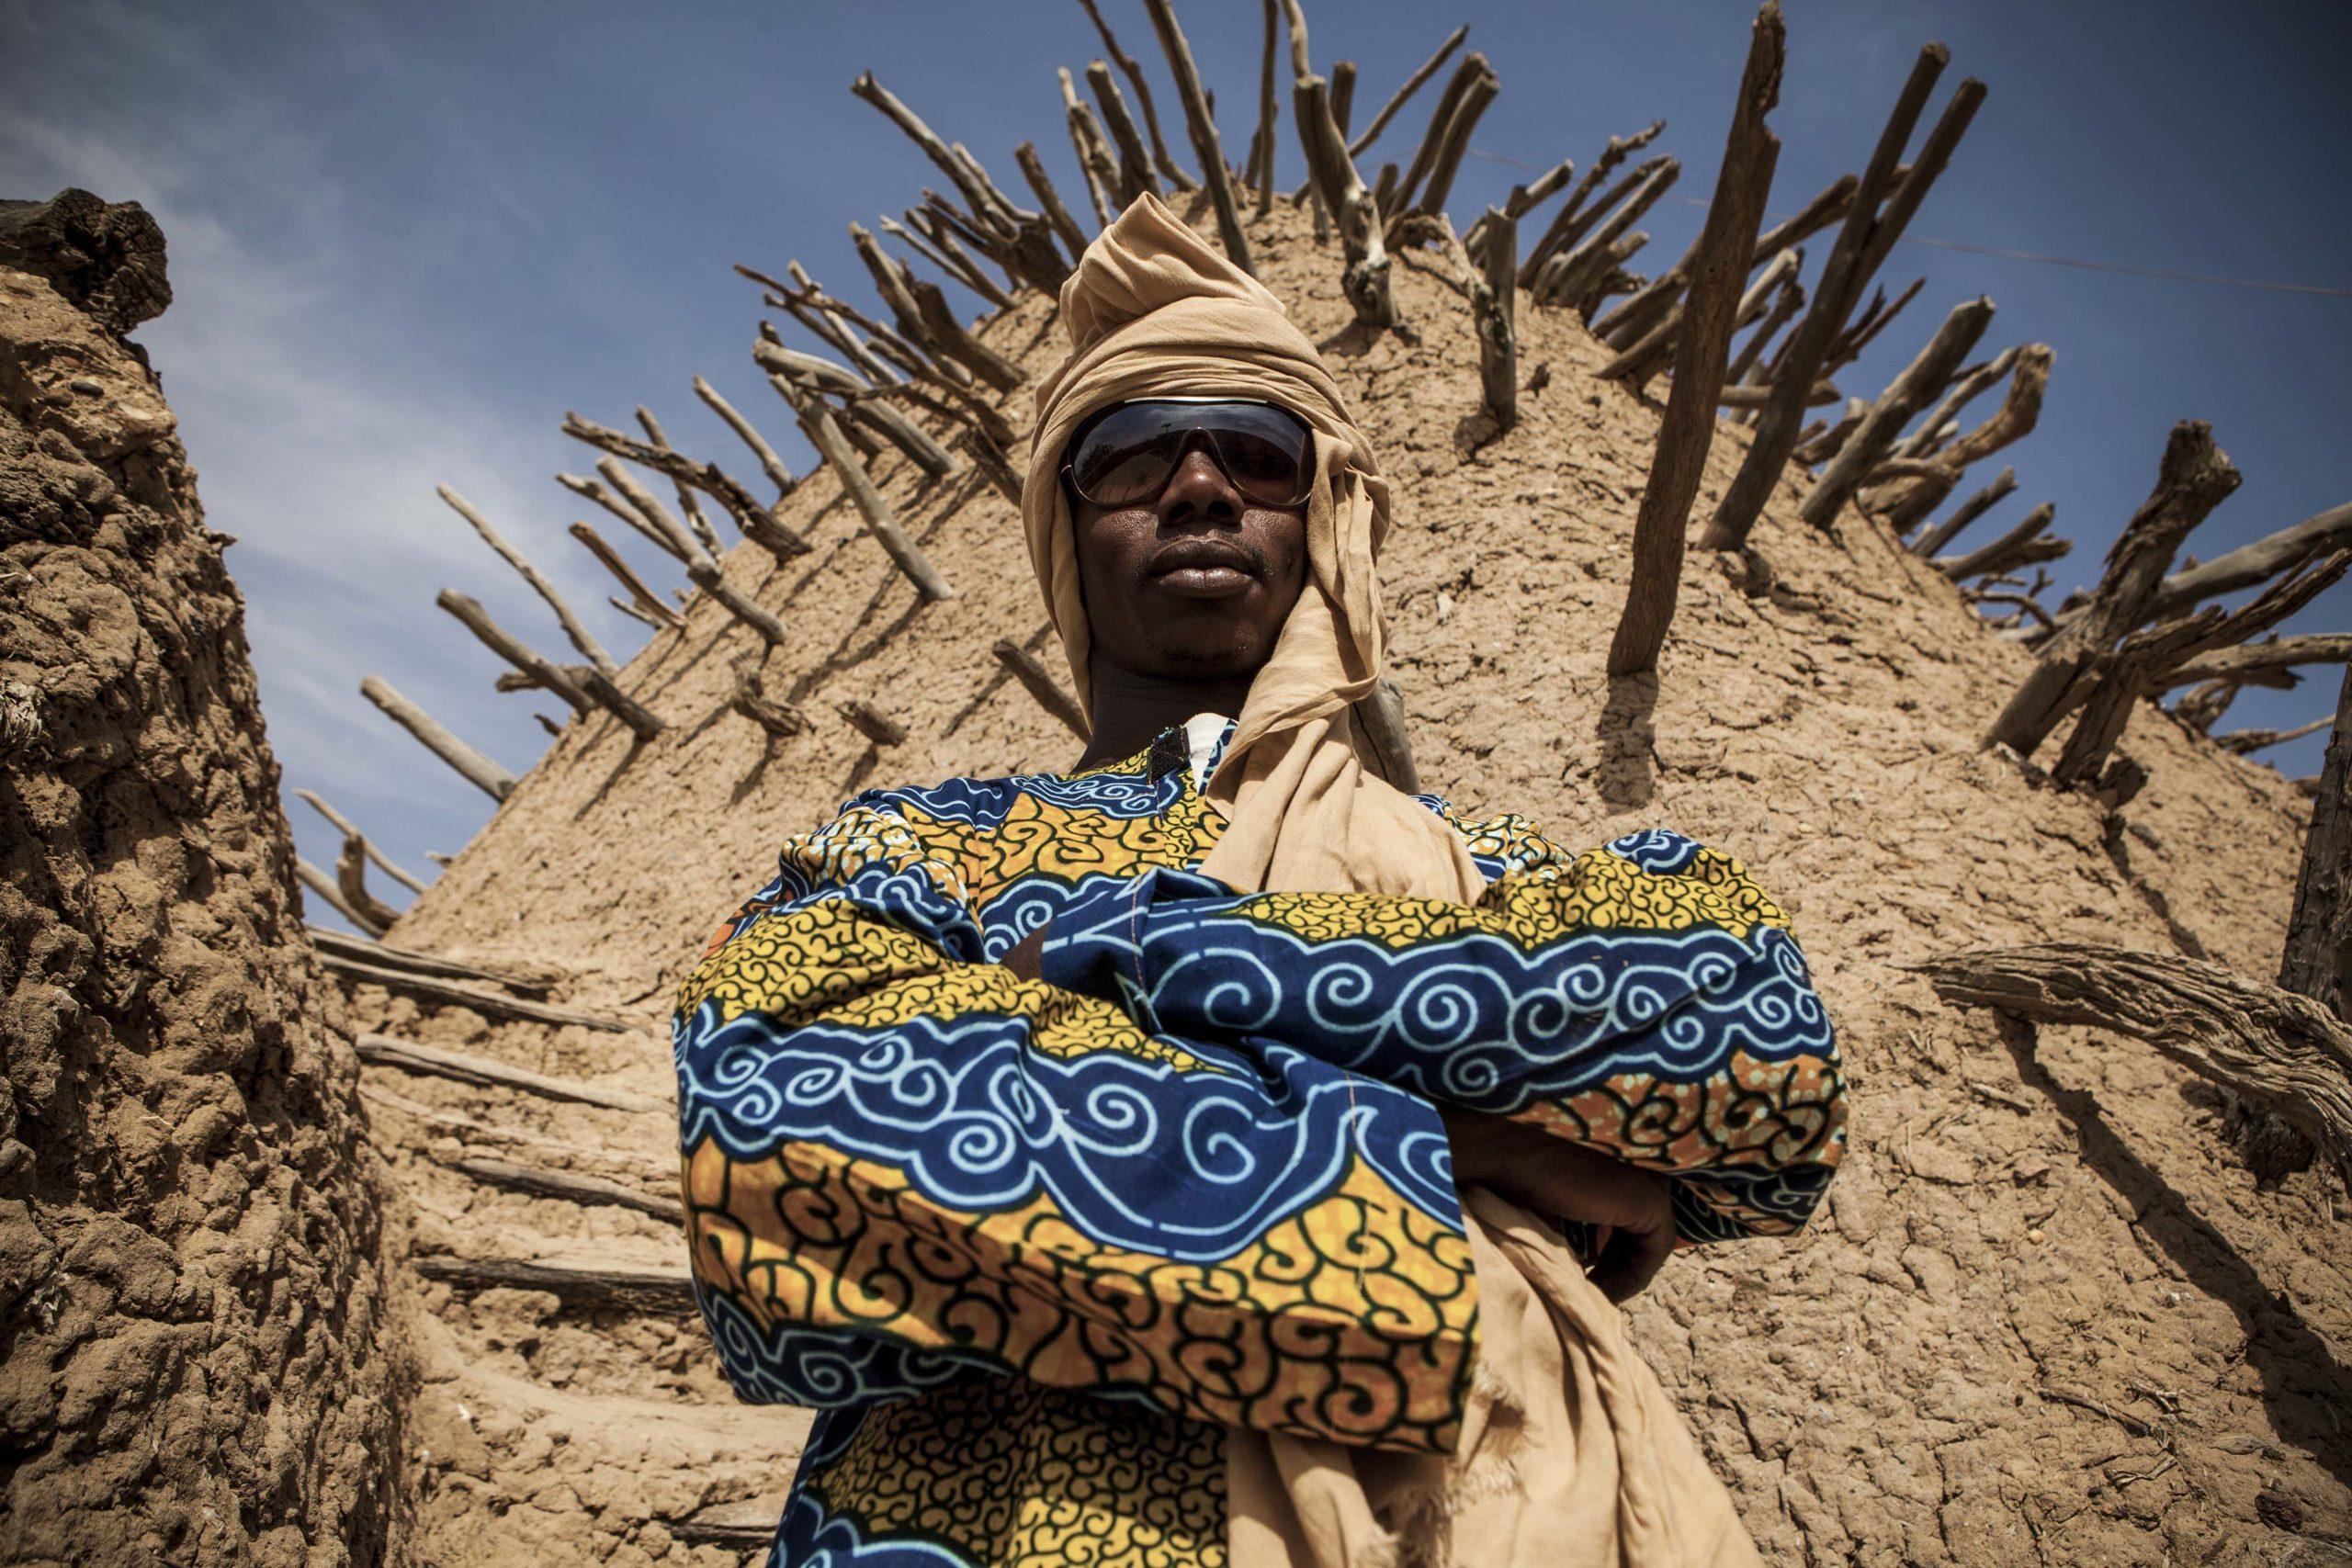 NEW FRAME: African futurism through Sahel Sounds